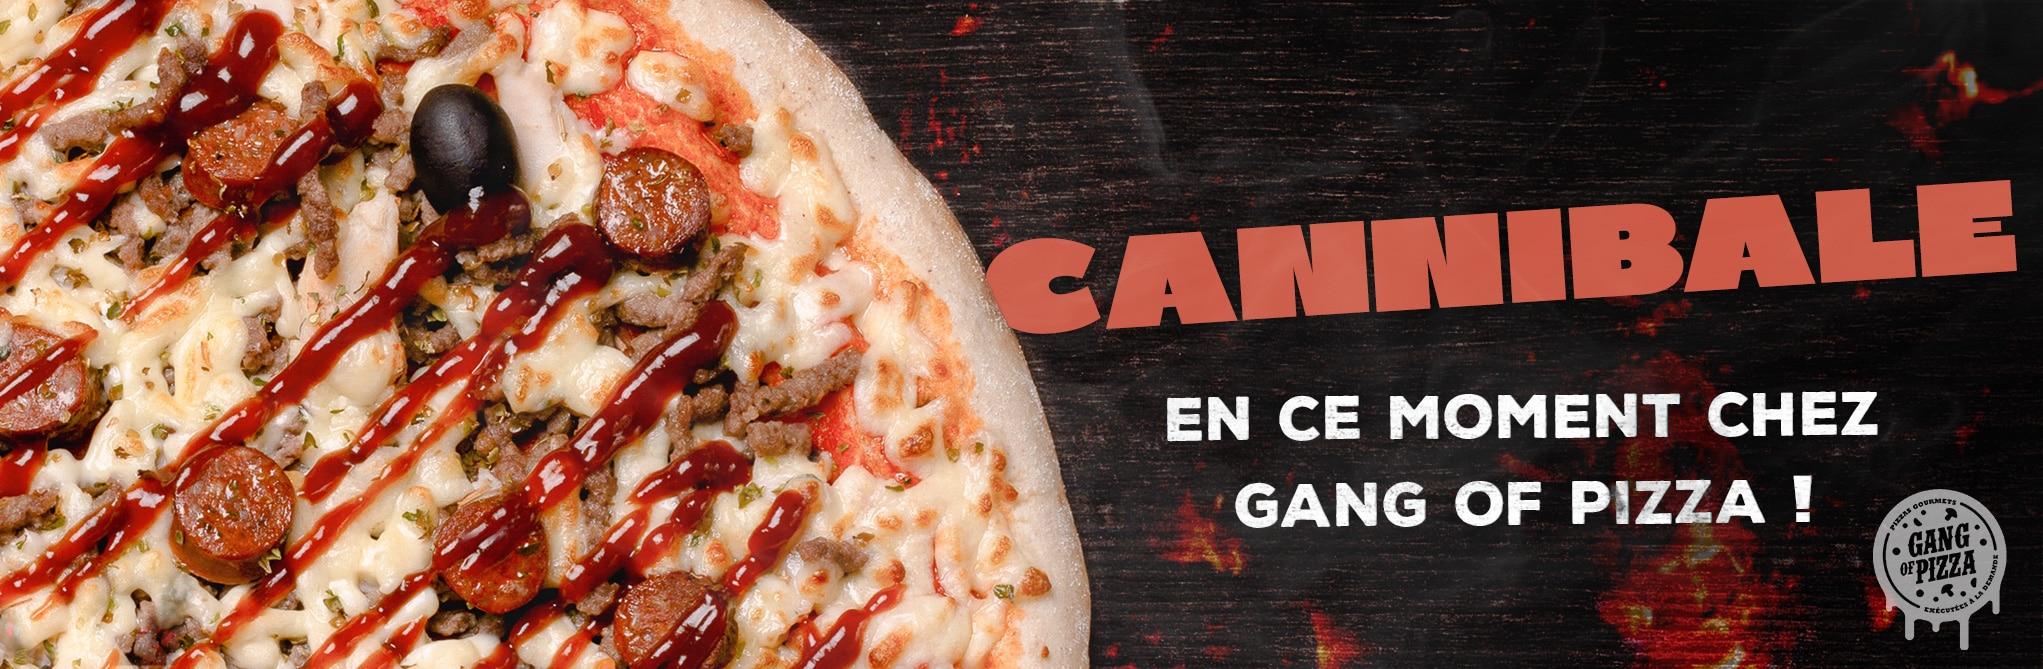 la-cannibale-gang-of-pizza